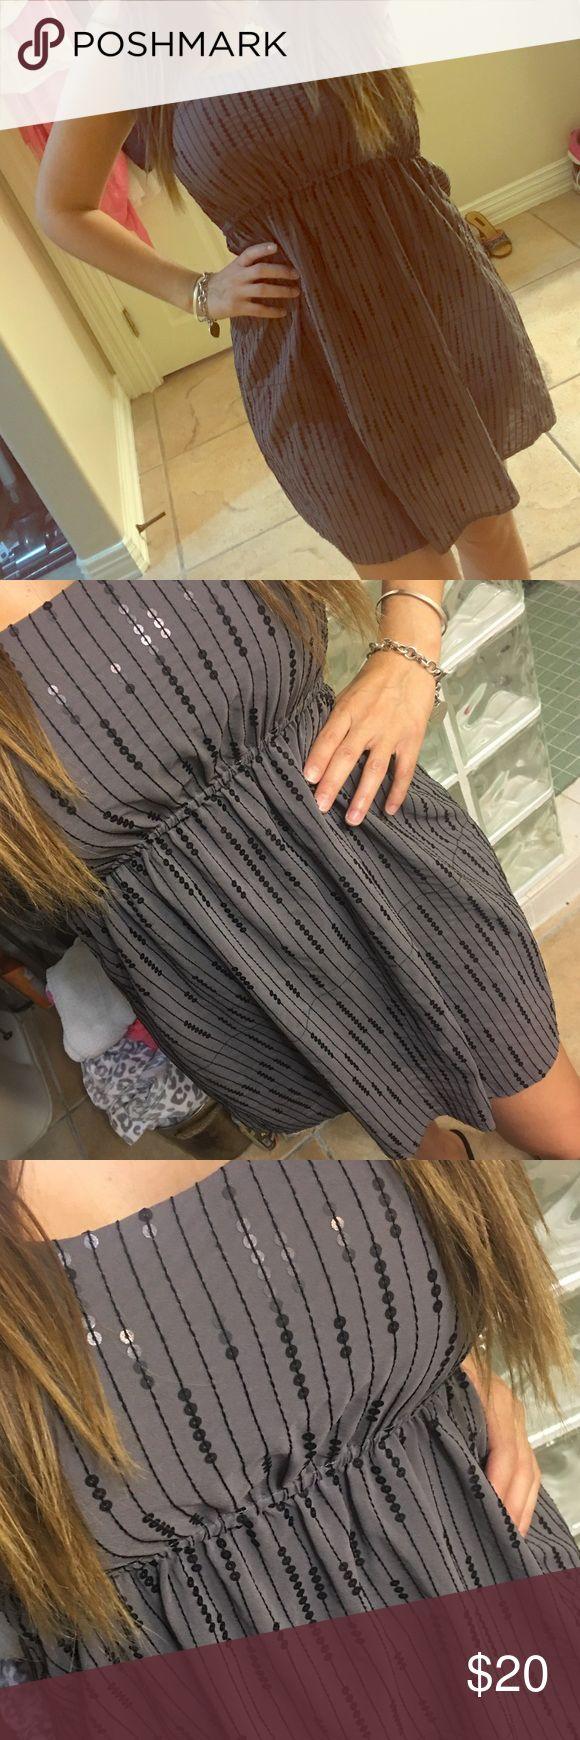 Grey Sequin Dress Grey Sequin Dress with spaghetti straps. Super cute. Excellent condition. Dresses Midi